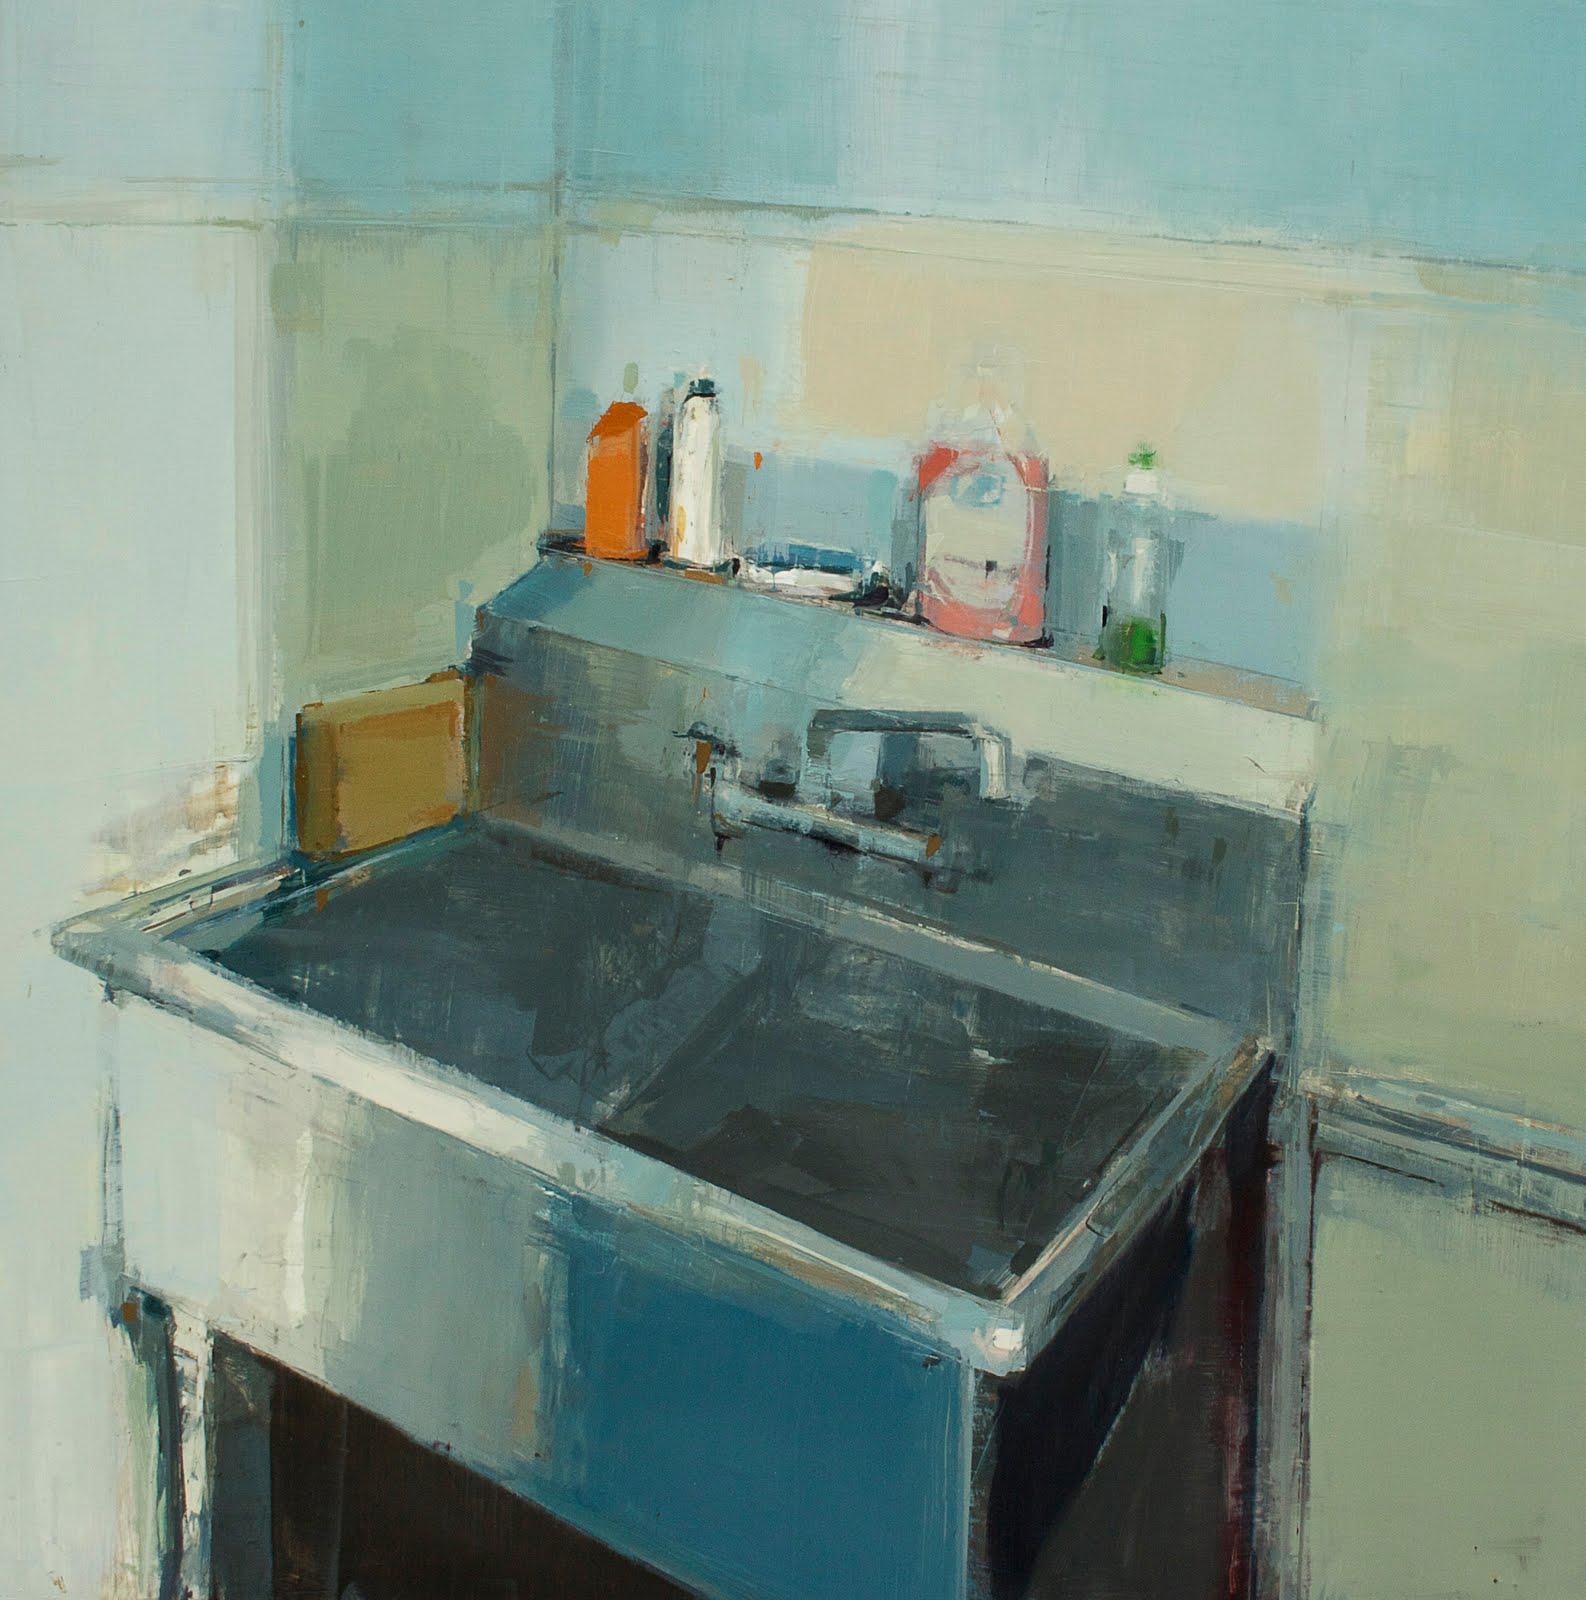 http://2.bp.blogspot.com/_4ZkStP_uiLo/S-20A533zdI/AAAAAAAAG3E/dK4JfRWRo2w/s1600/utility+sink+2.jpg